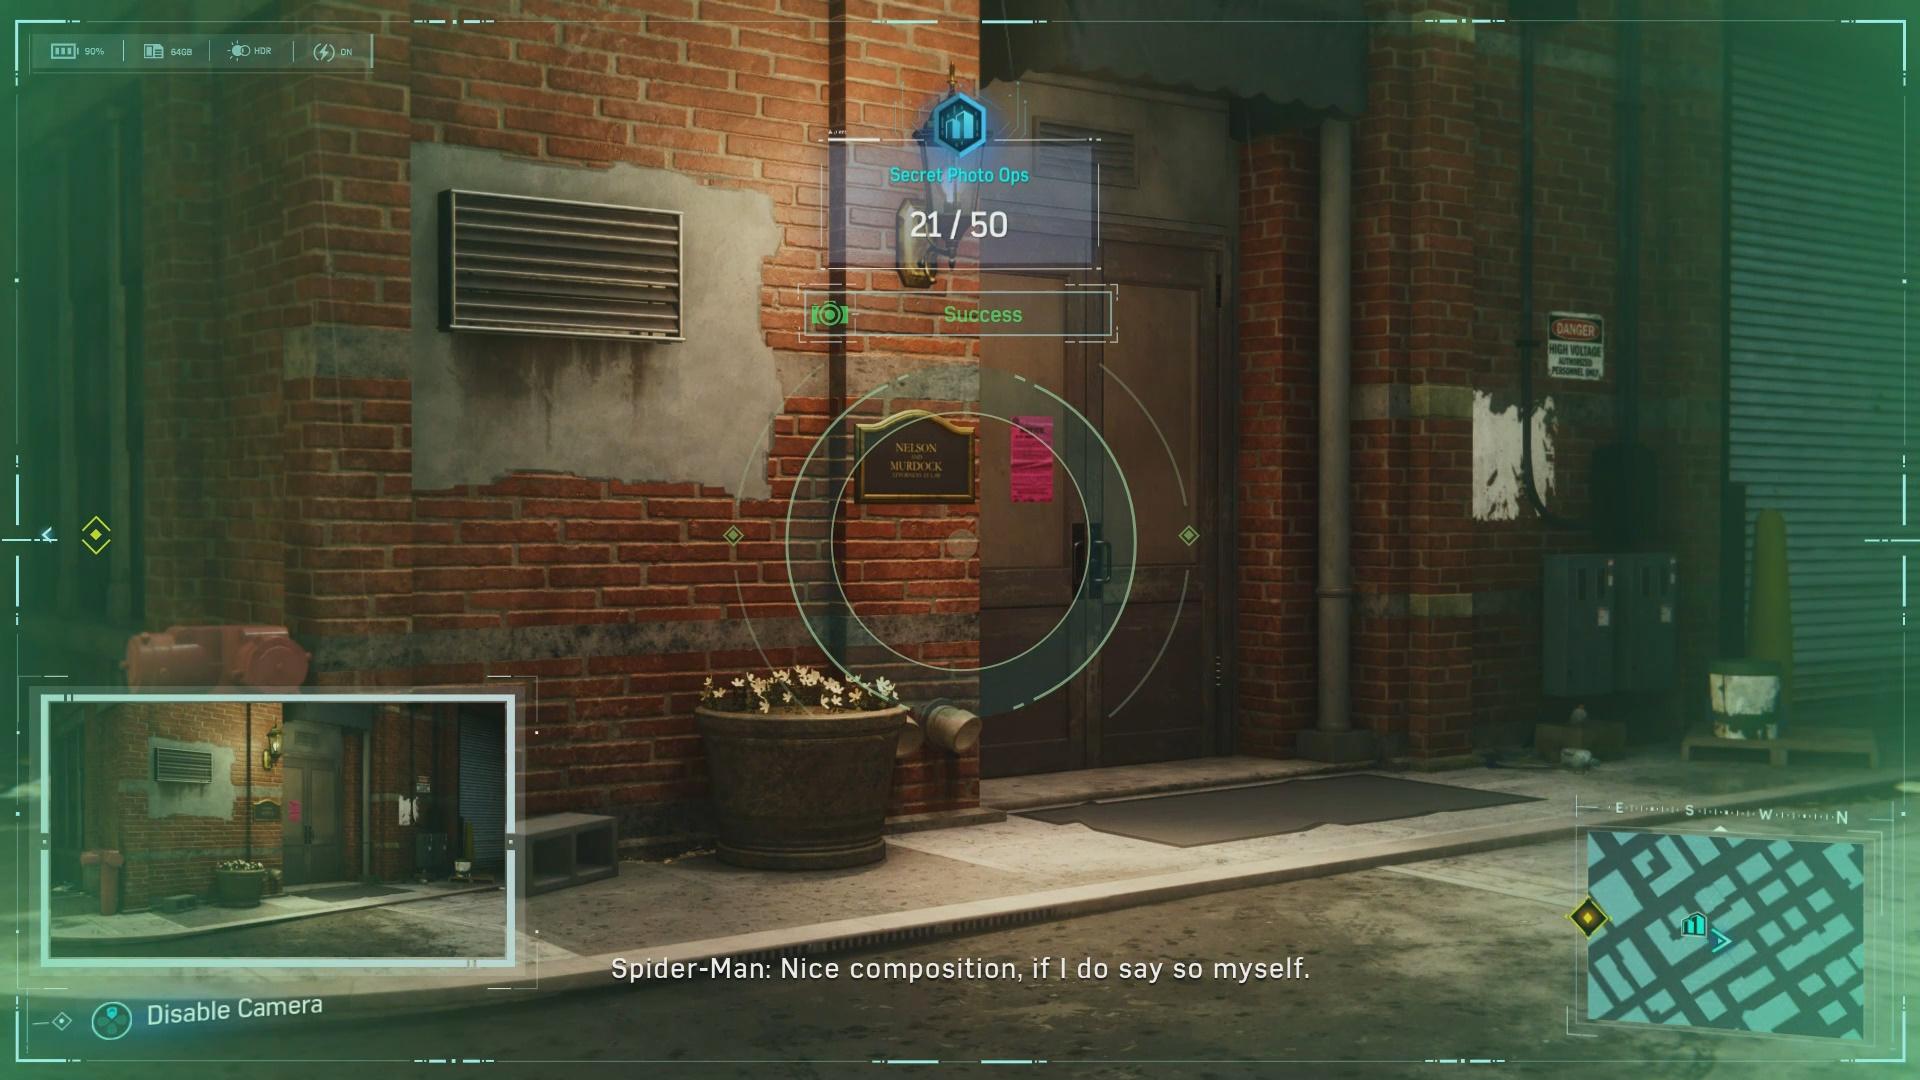 Secret Photo Op Locations in Spider-Man PS4 (ESU Suit Unlock)